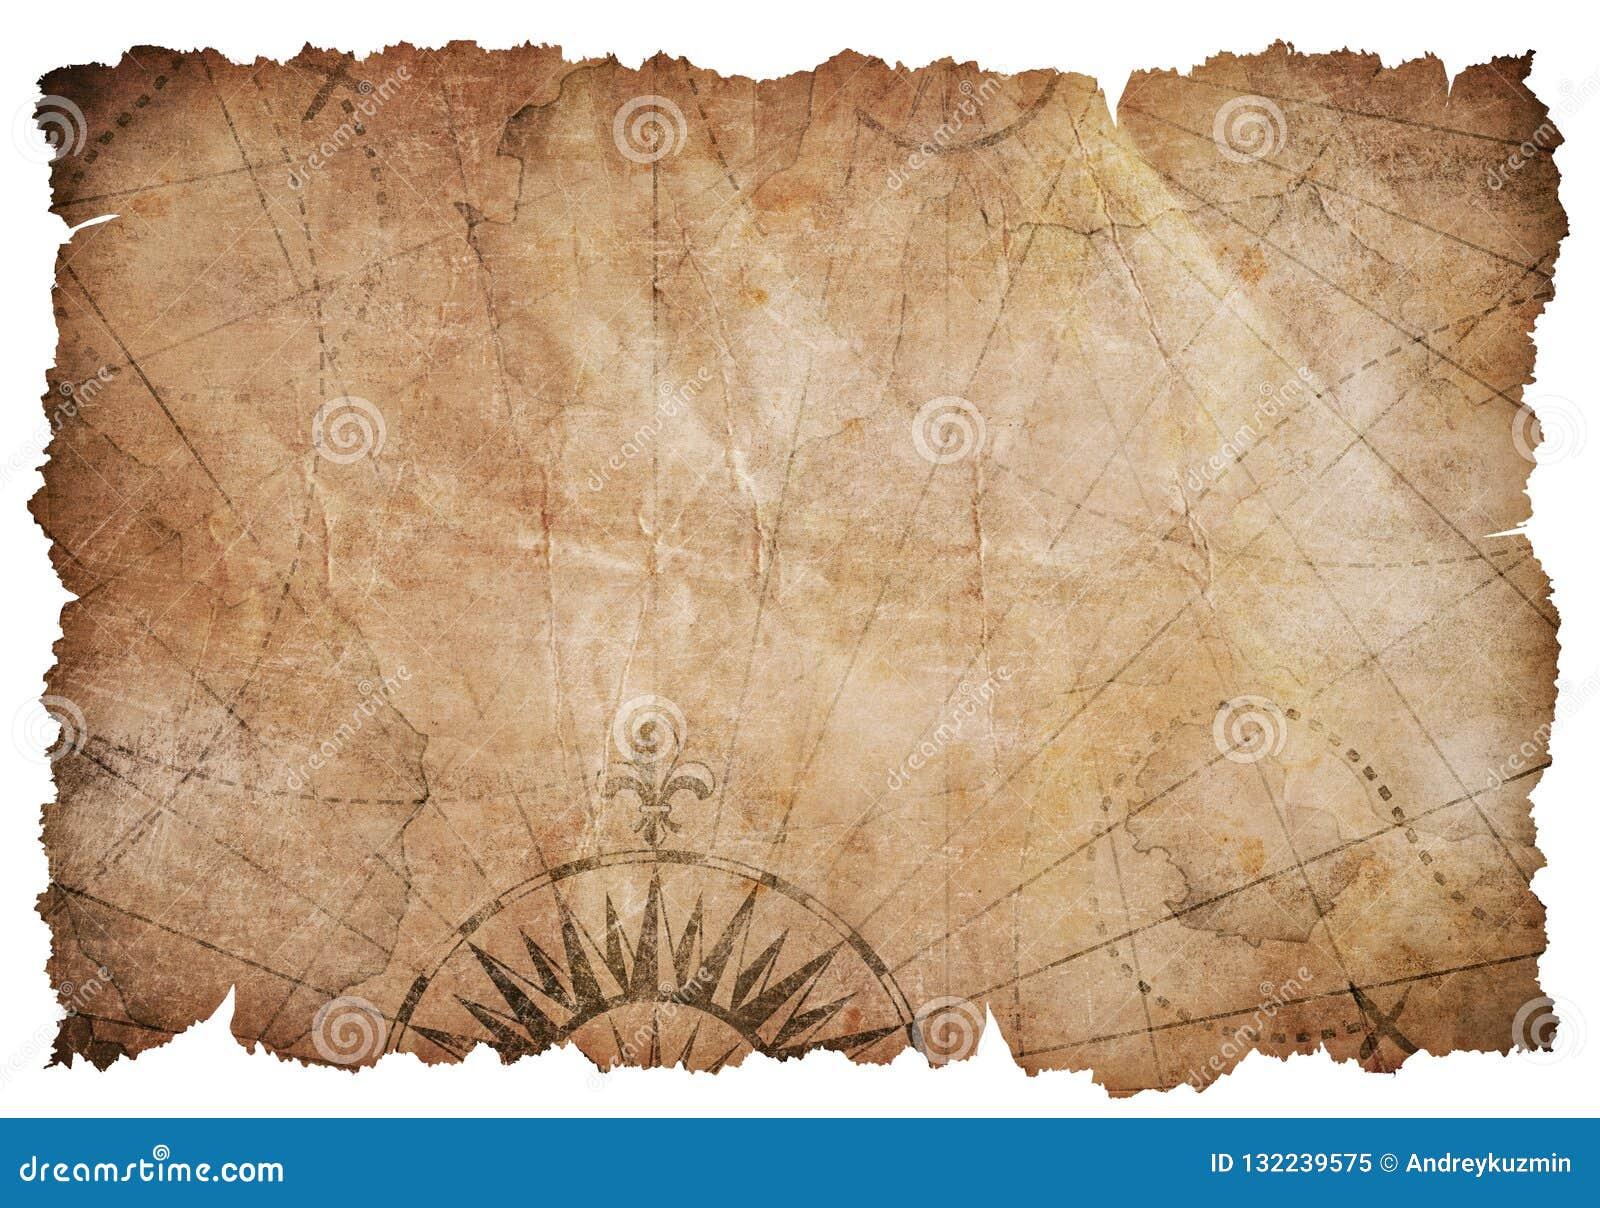 Carte Au Tresor Dechire.La Vieille Carte Dechiree De Tresor A Isole Image Stock